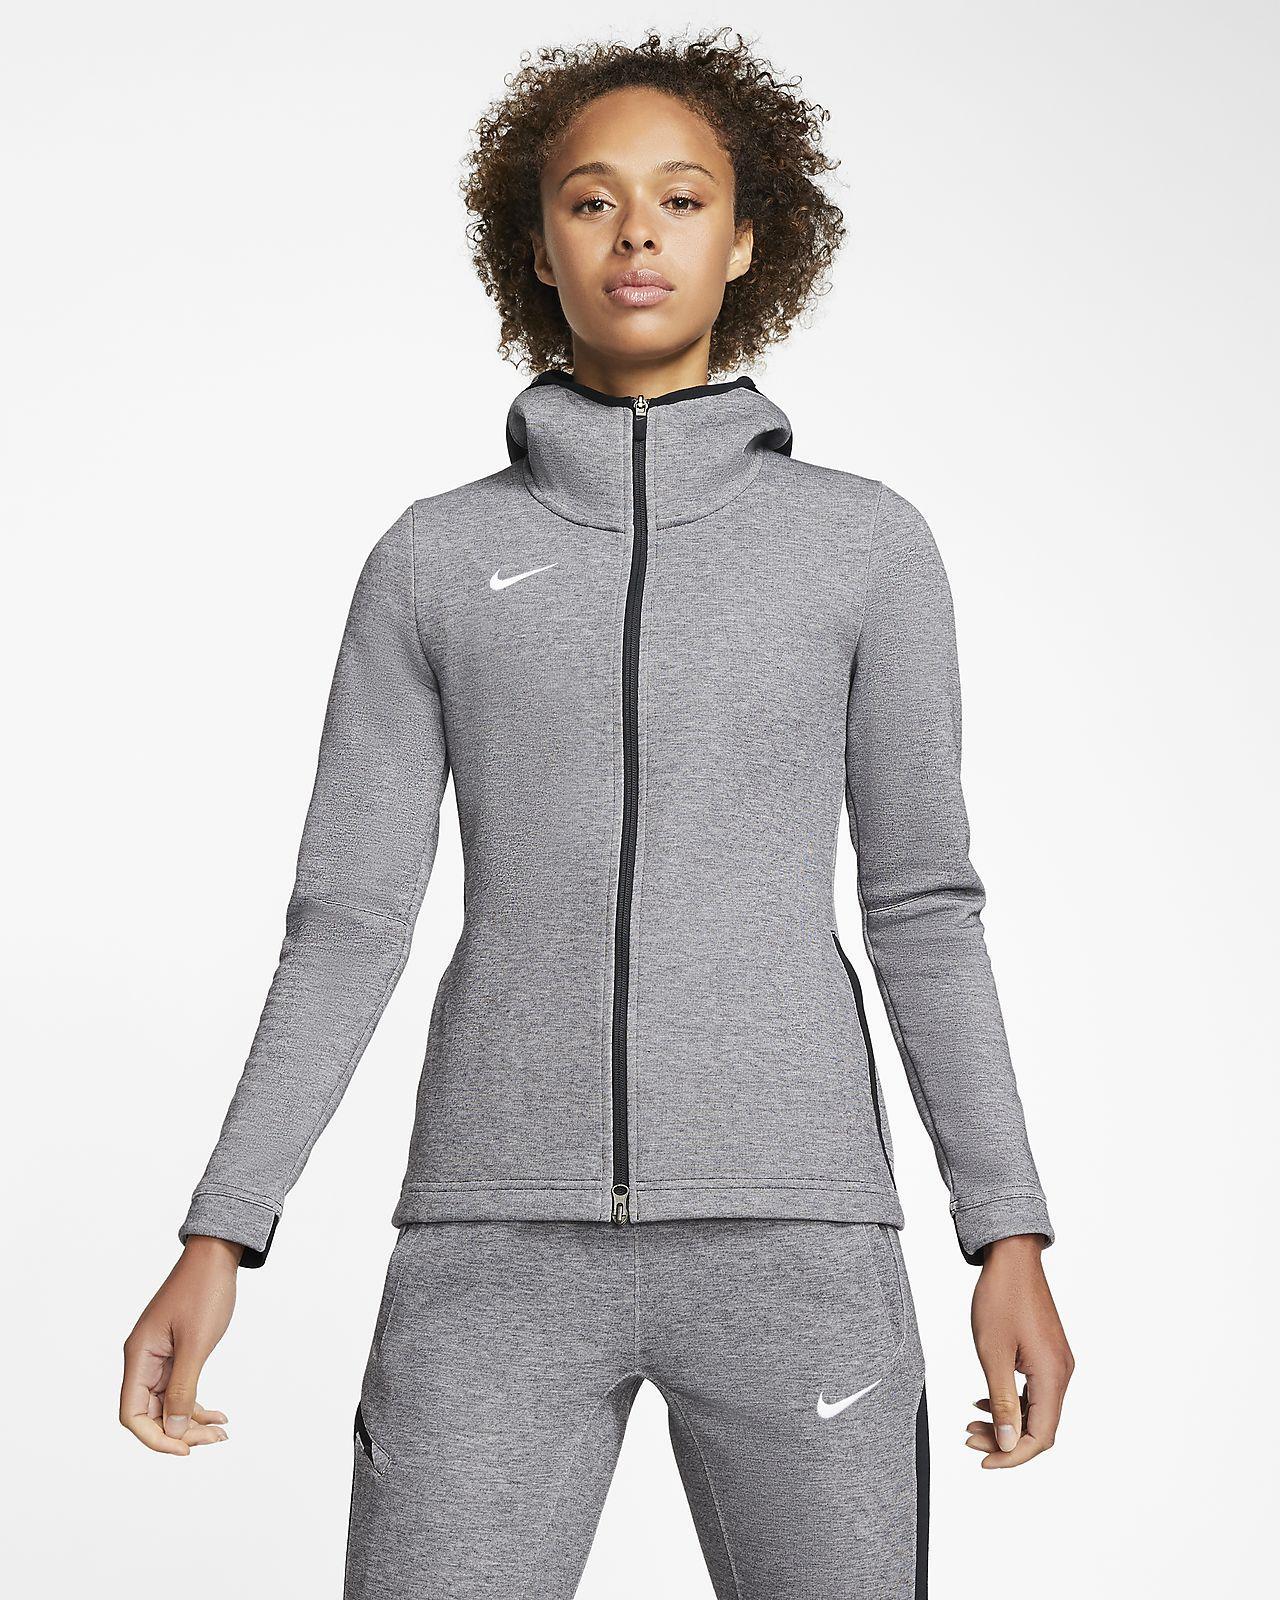 Nike Dri-FIT Showtime Women's Full-Zip Basketball Hoodie (Stock)